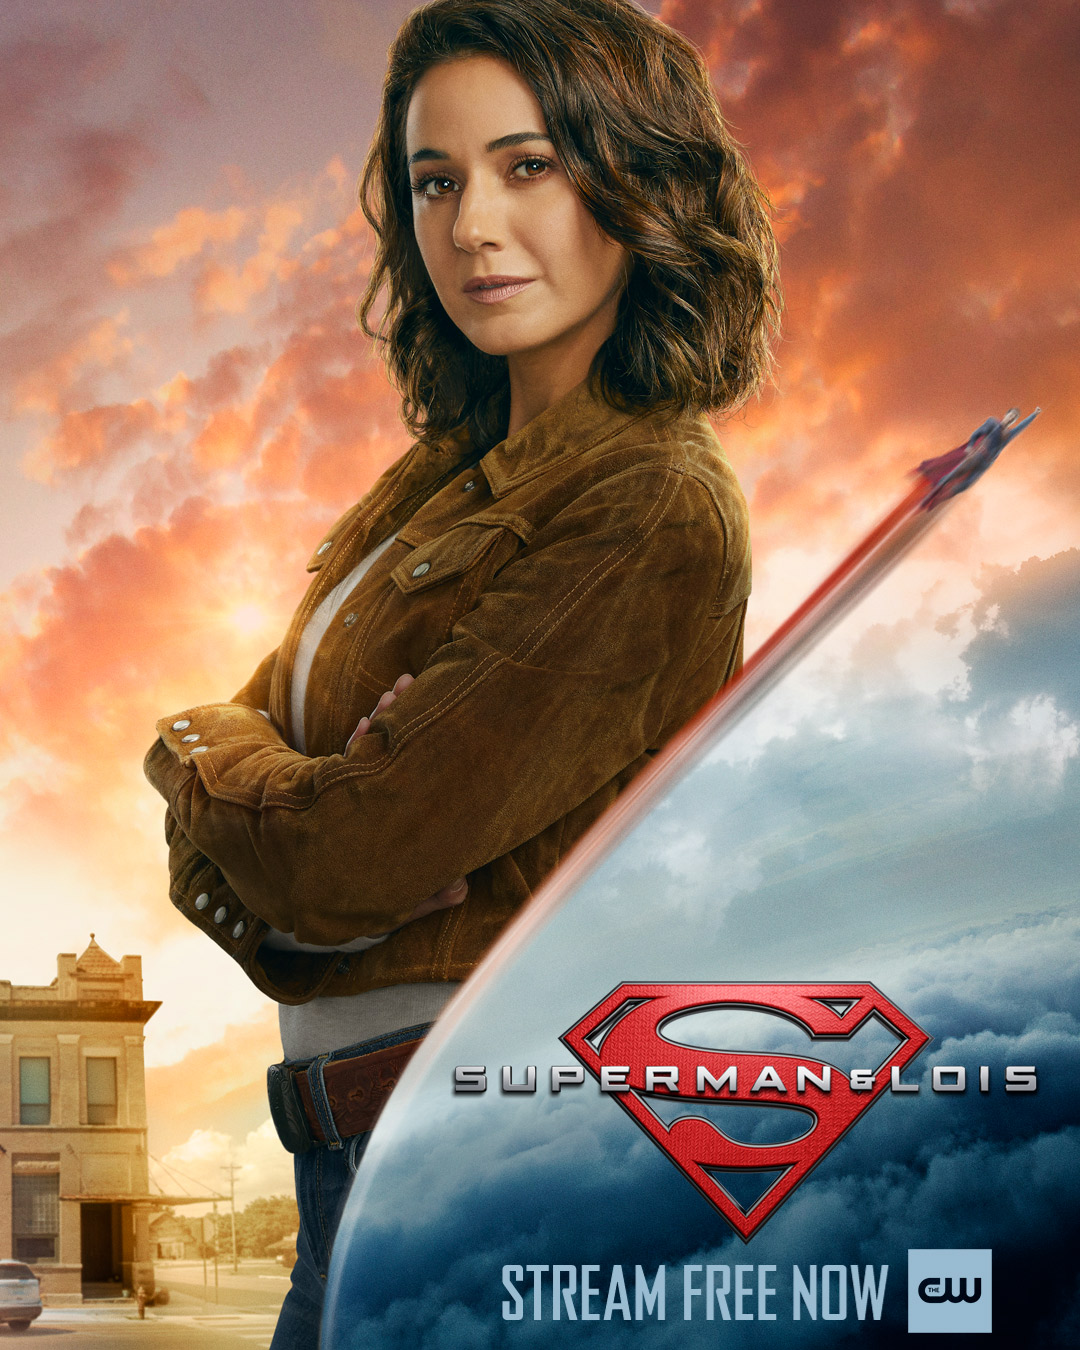 Lana Lang Cushing (Emmanuelle Chriqui) en un póster de Superman & Lois. Imagen: Superman & Lois Twitter (@cwsupermanandlois).